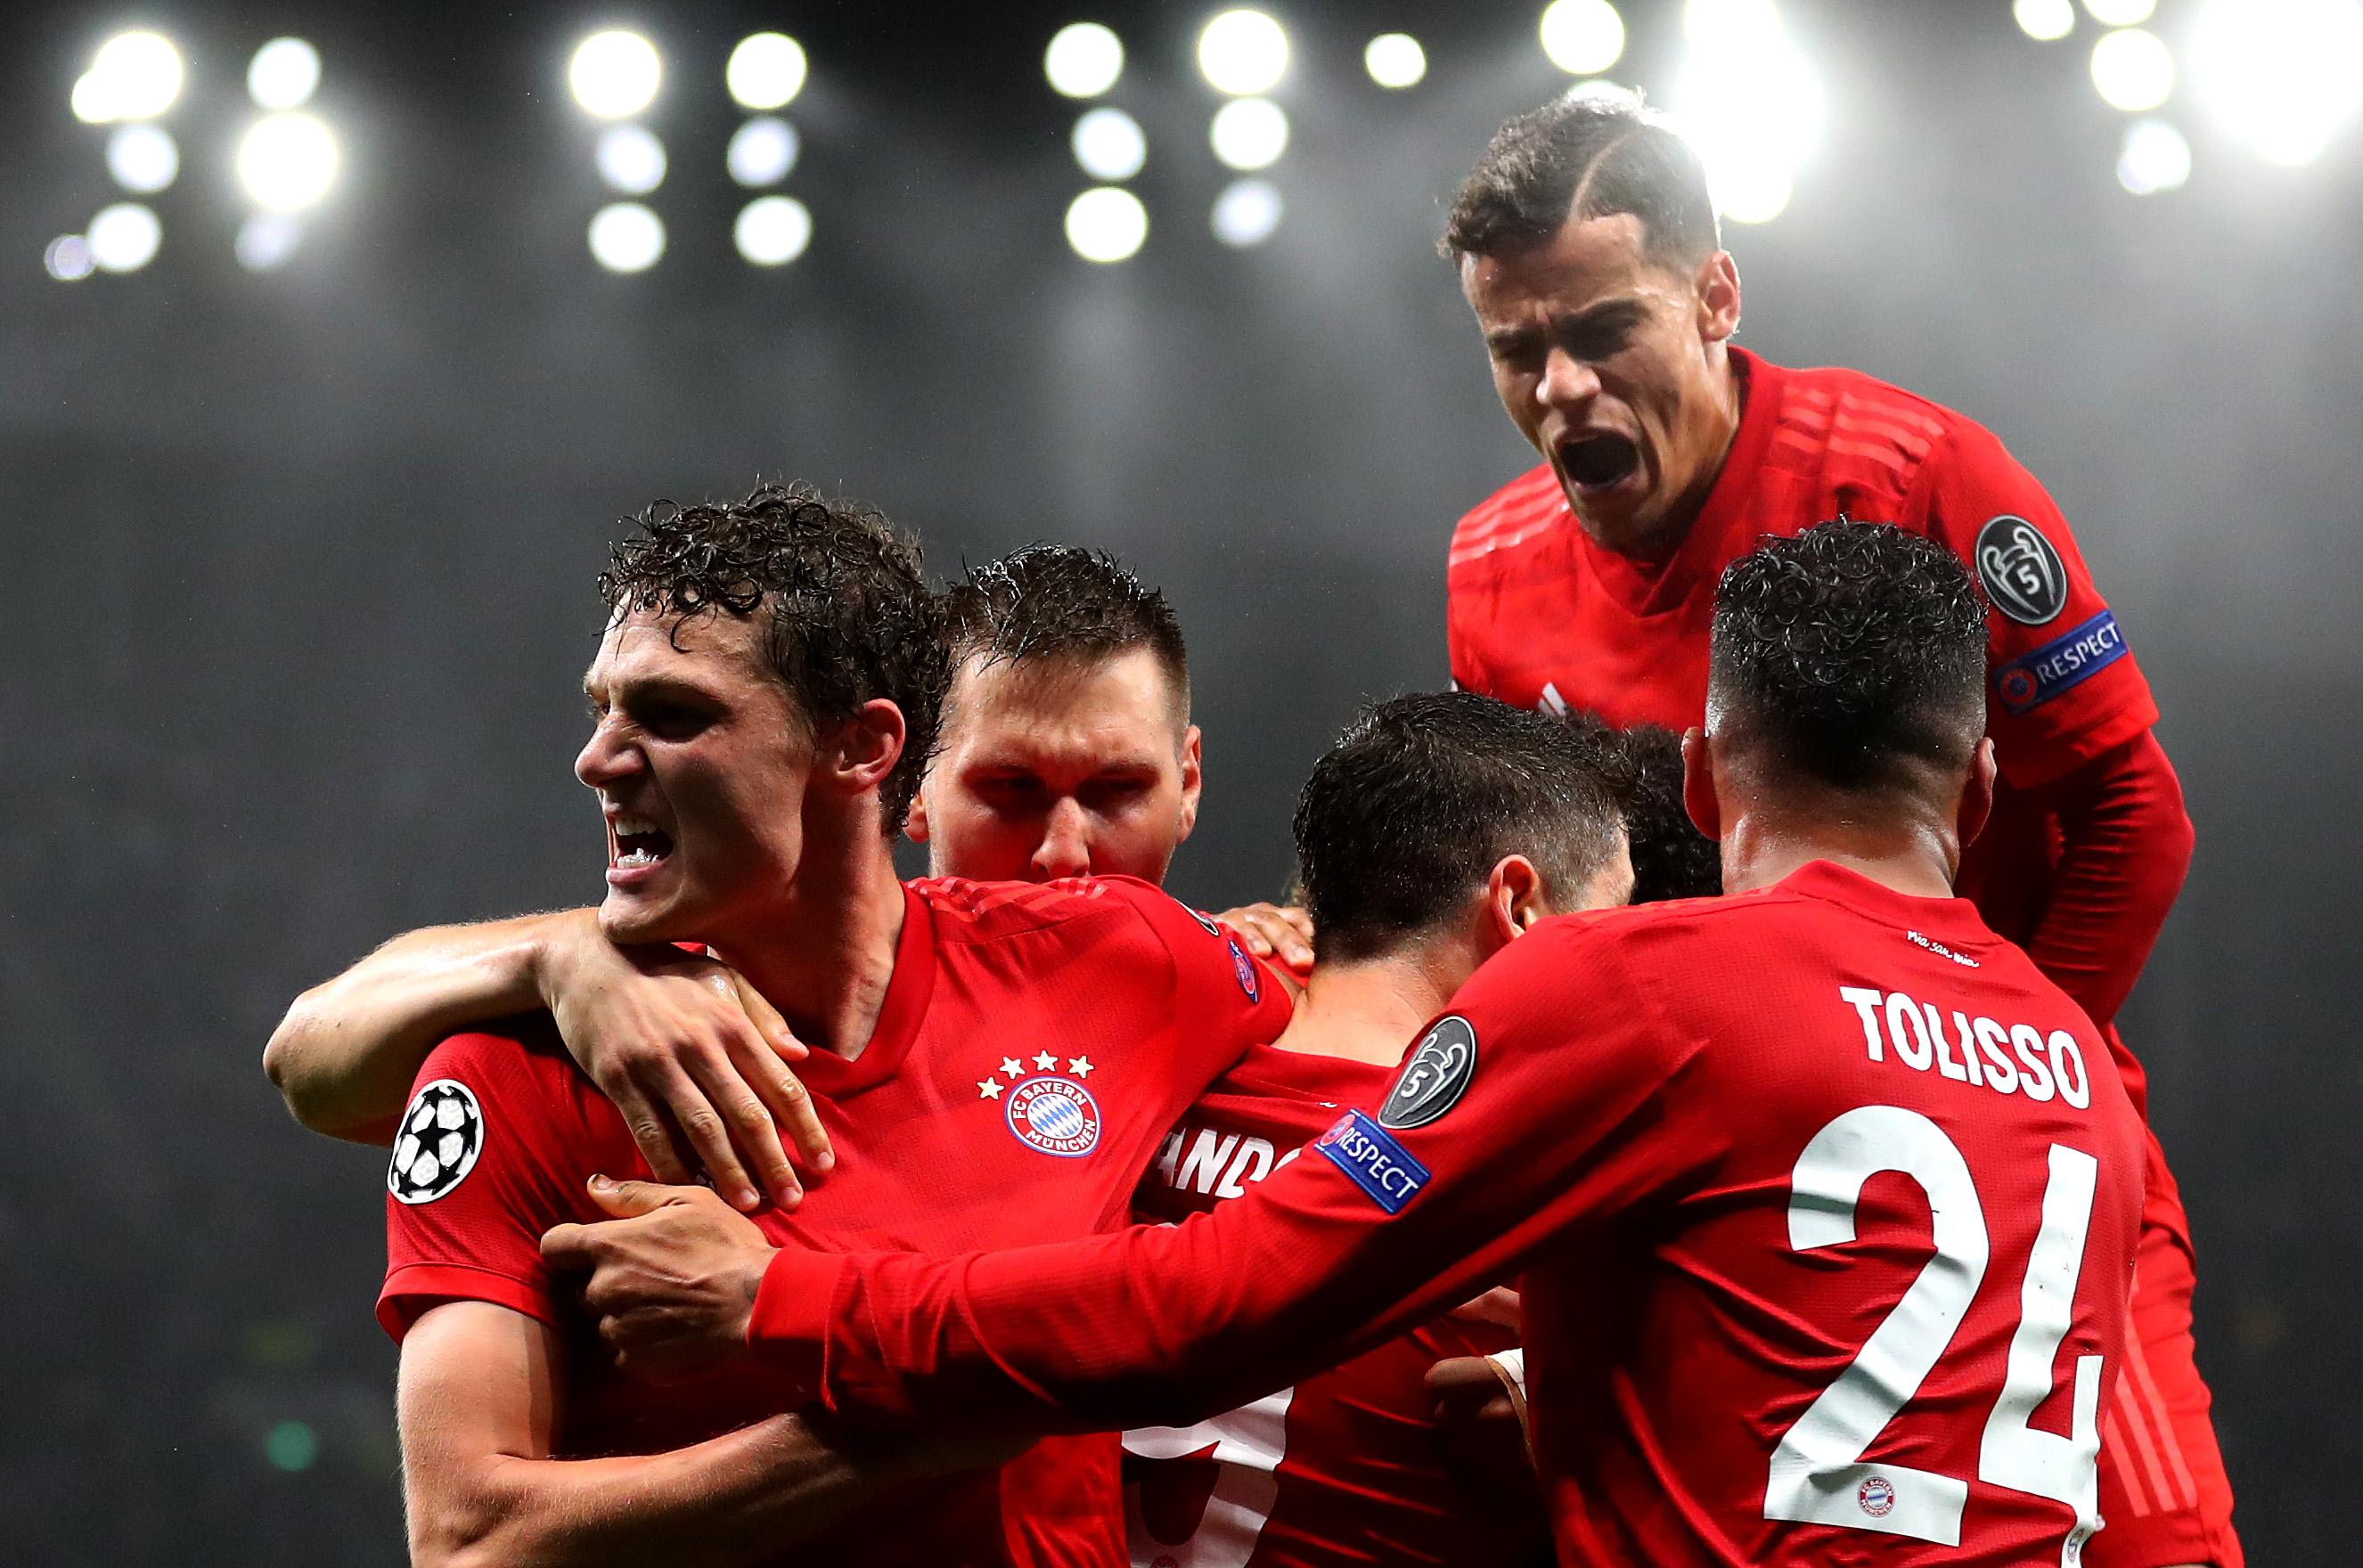 Fussball Heute Vfl Bochum Fc Bayern Munchen Im Live Stream